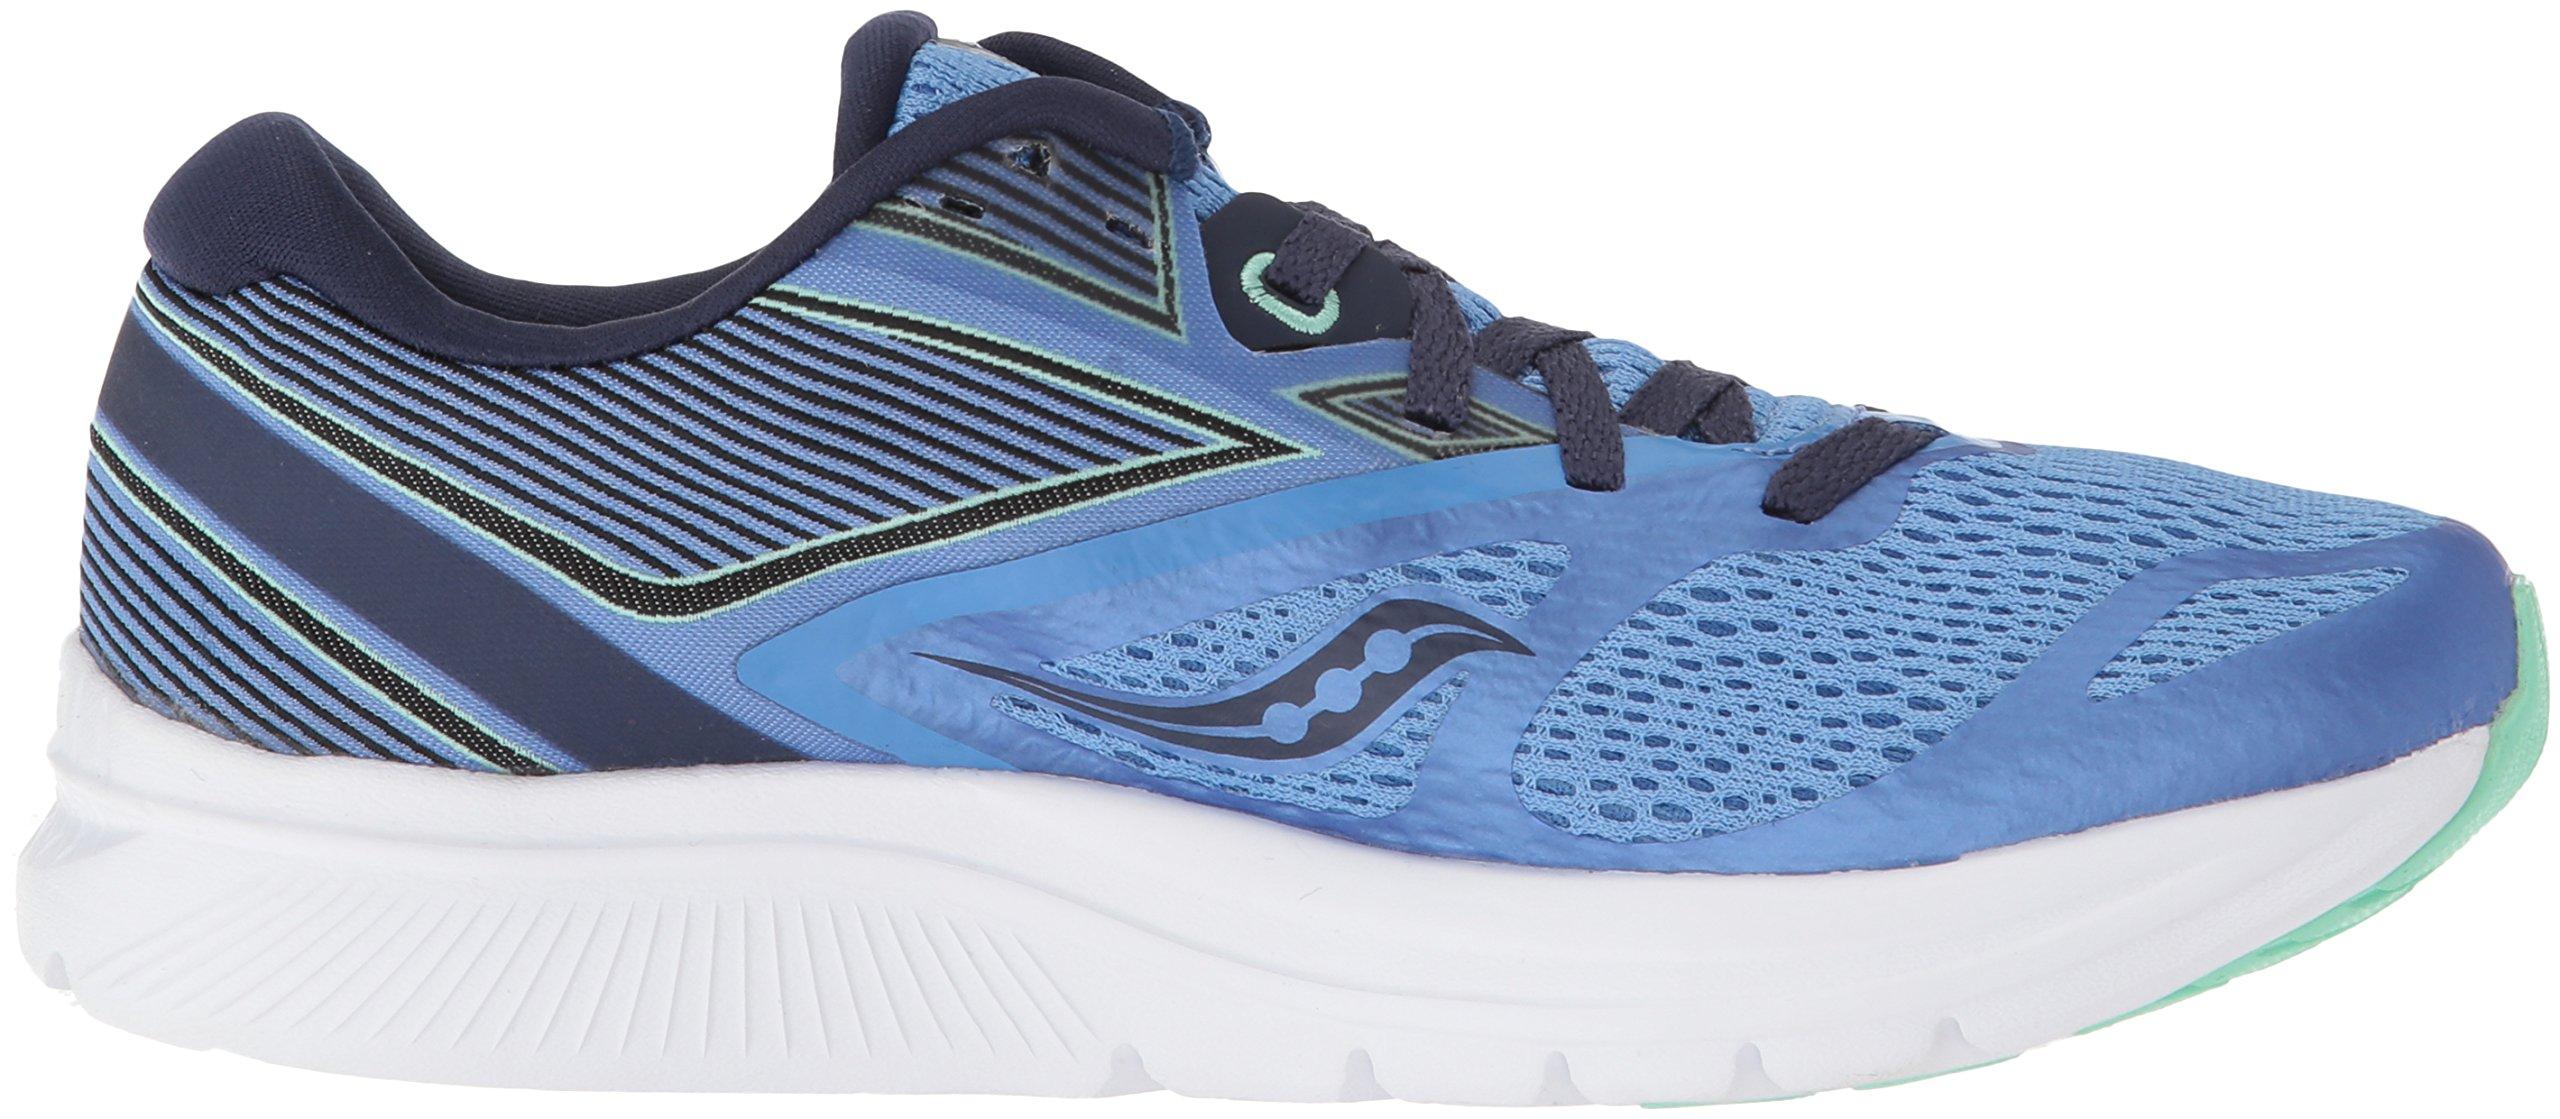 Saucony Women's Kinvara 9 Running Shoe, Blue/Teal, 9.5 Medium US by Saucony (Image #6)